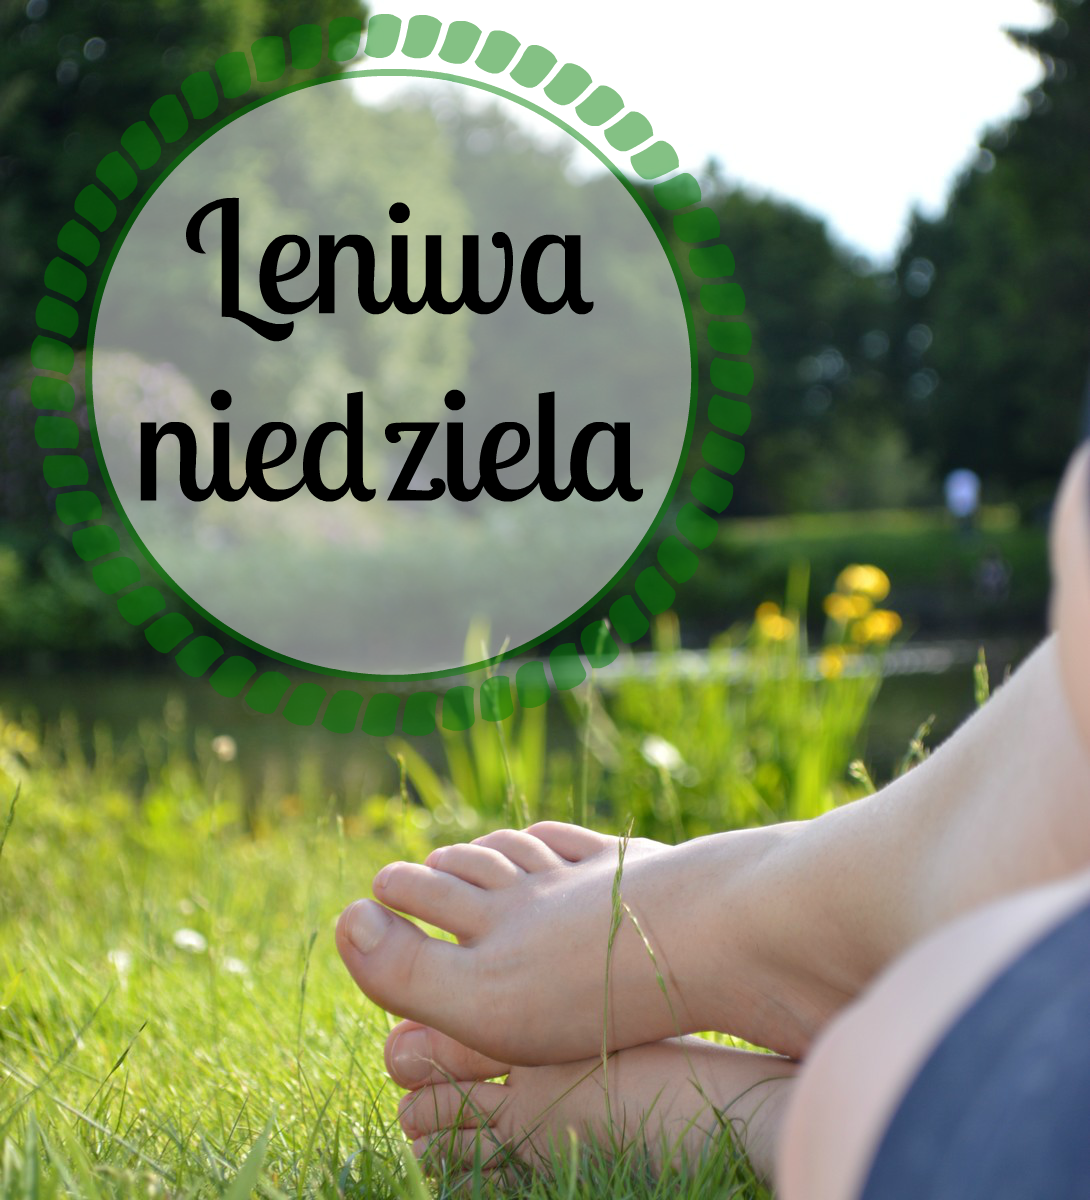 http://raisin1989.blogspot.de/2014/05/leniwa-niedziela.html